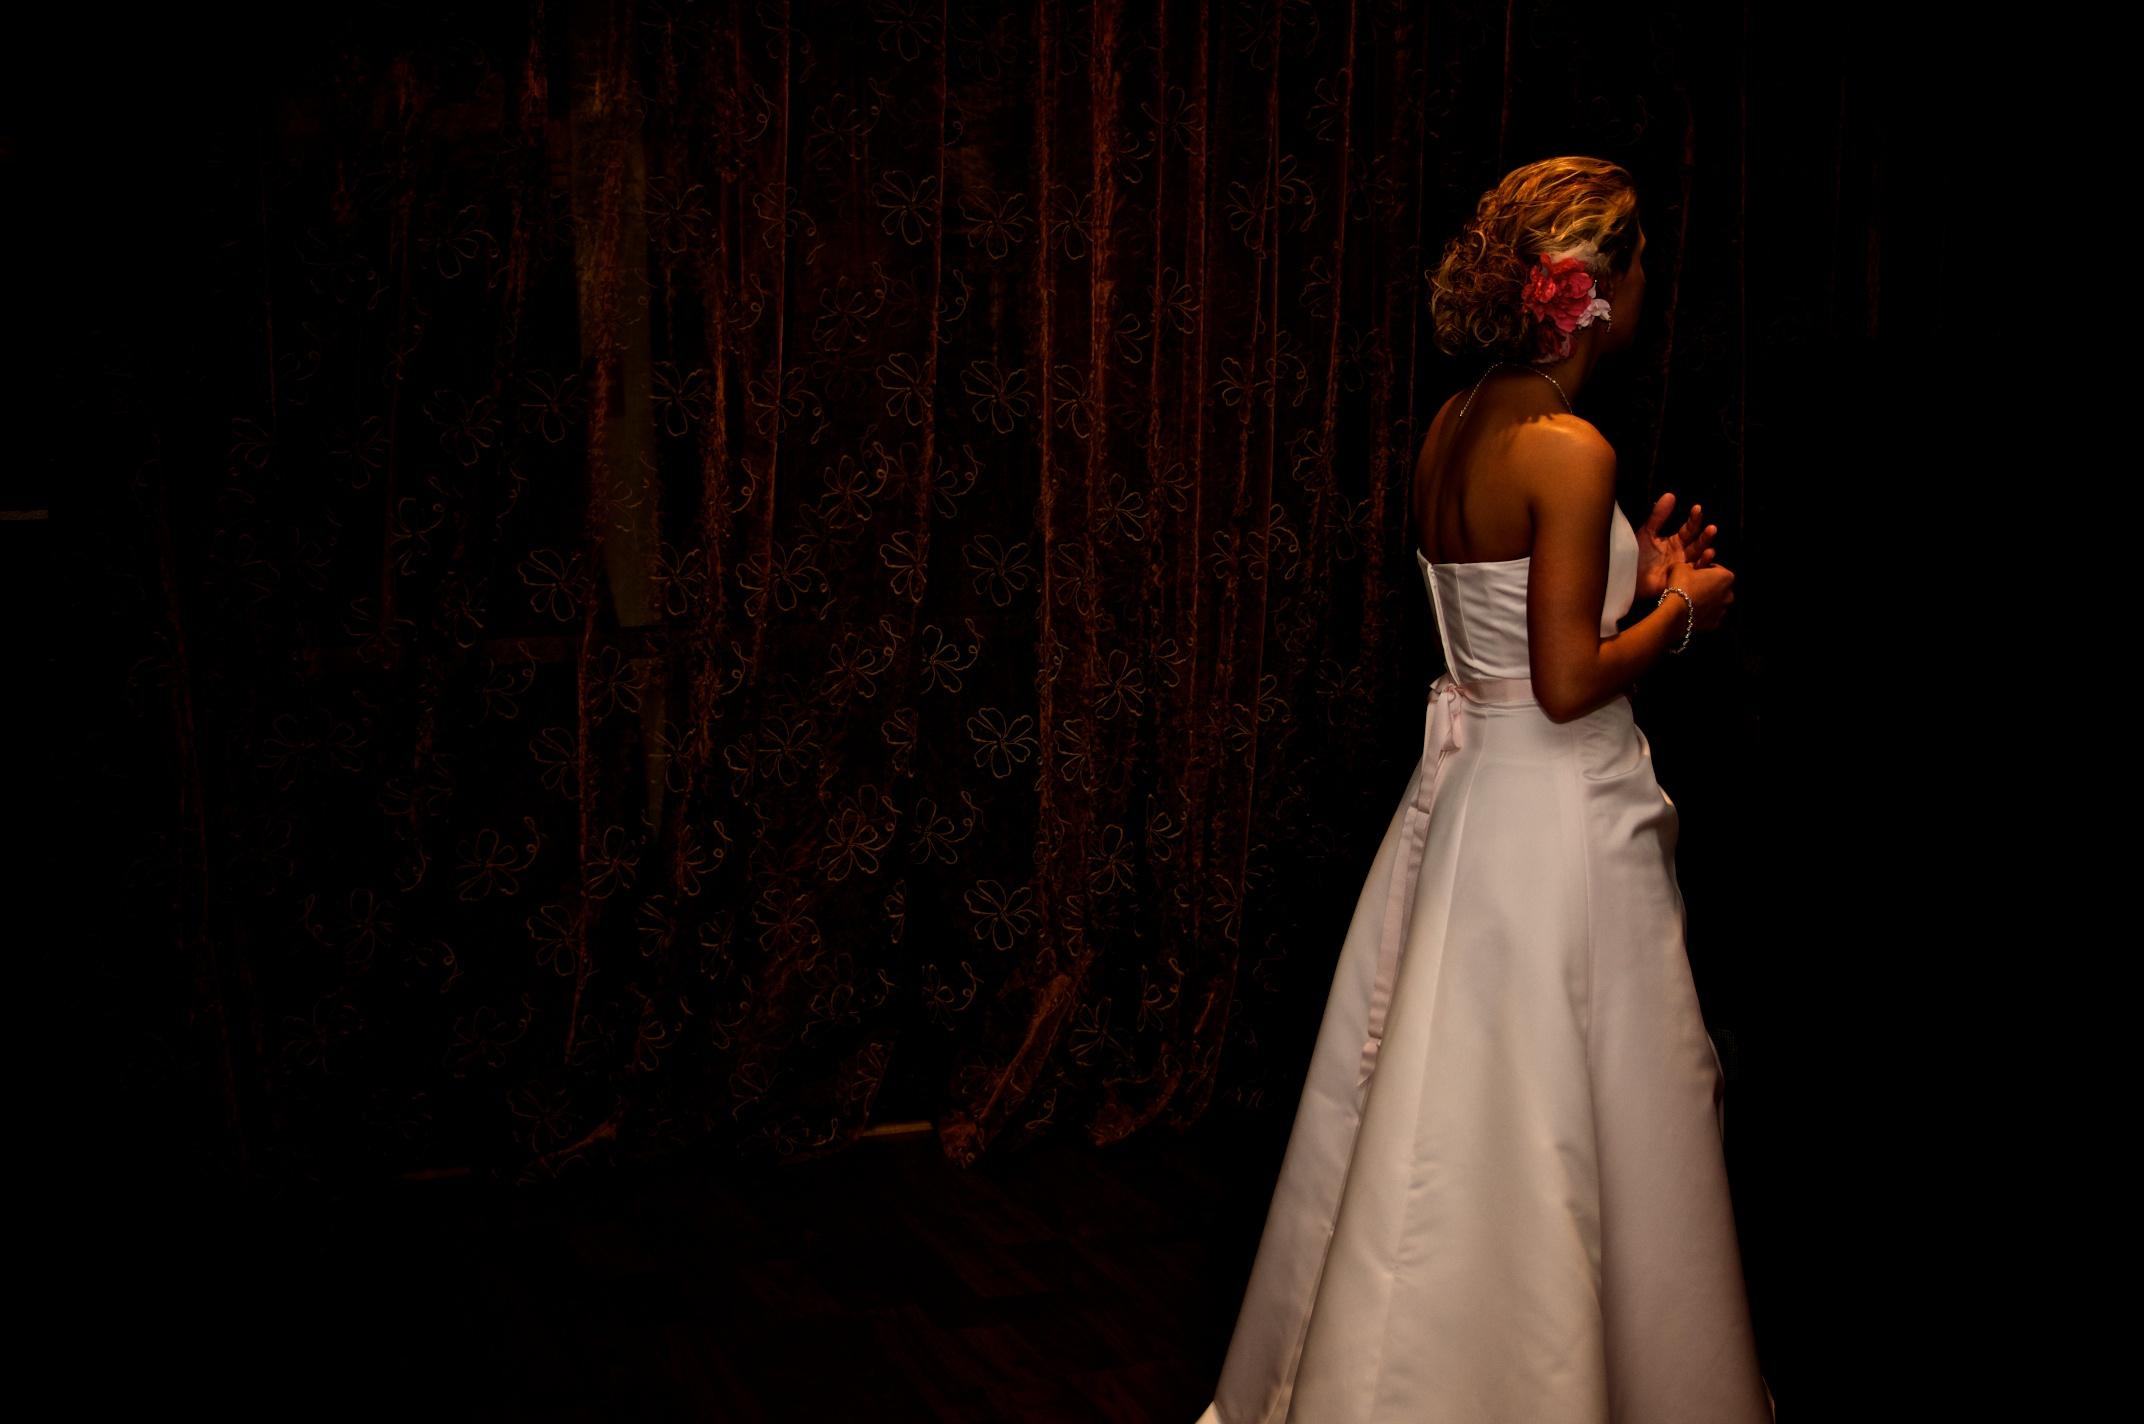 Dudeck+Wedding+%28finals-web%29+78-1930254498-O.jpg